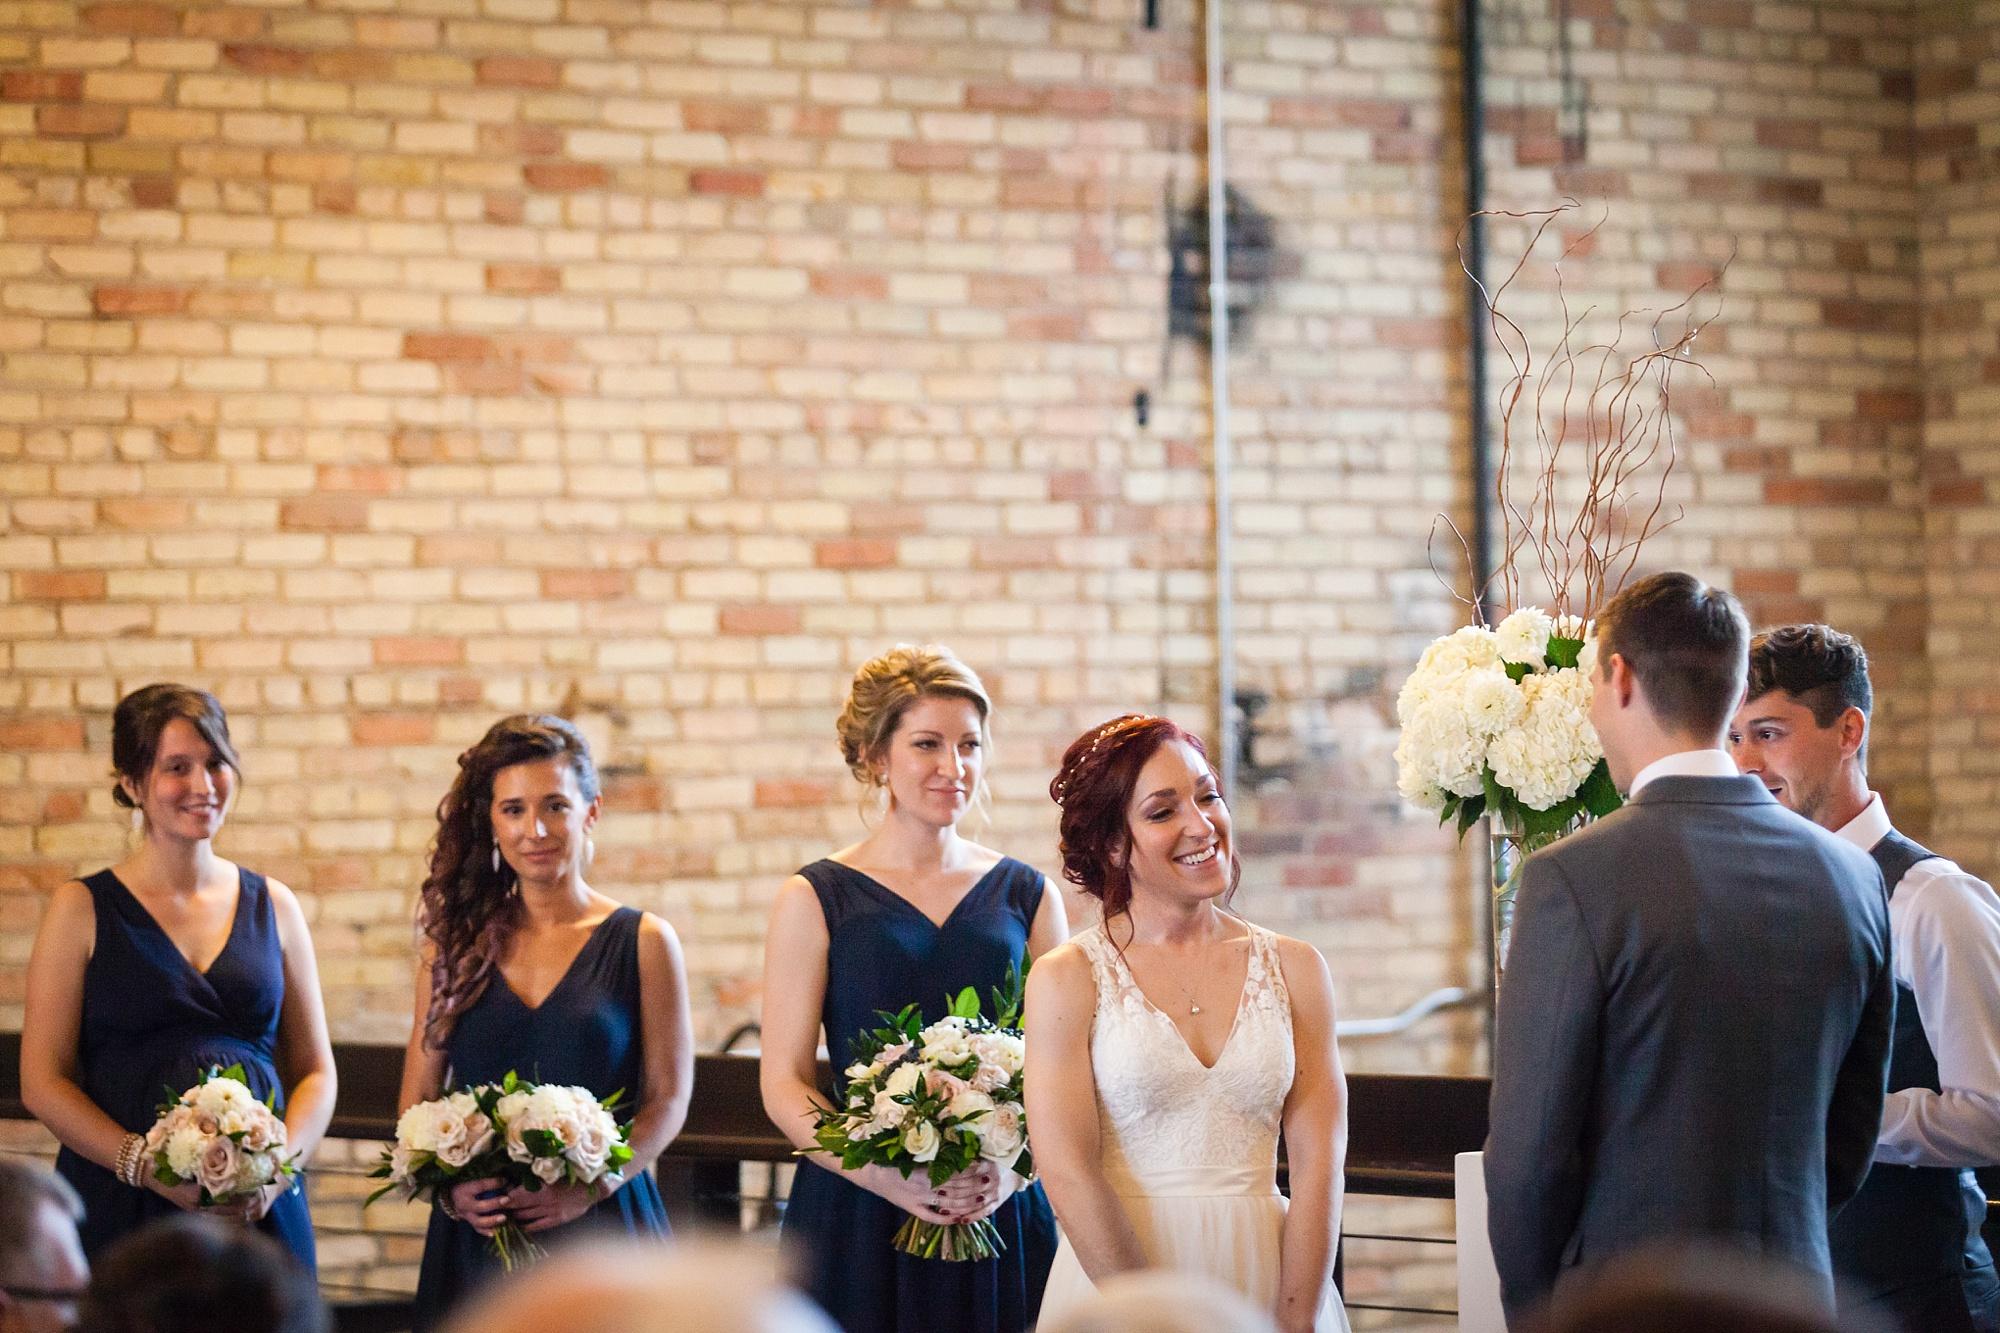 Brandon_Shafer_Photography_Lauren_Ethan_New_Vintage_Place_Grand_Rapids_Wedding_0037.jpg